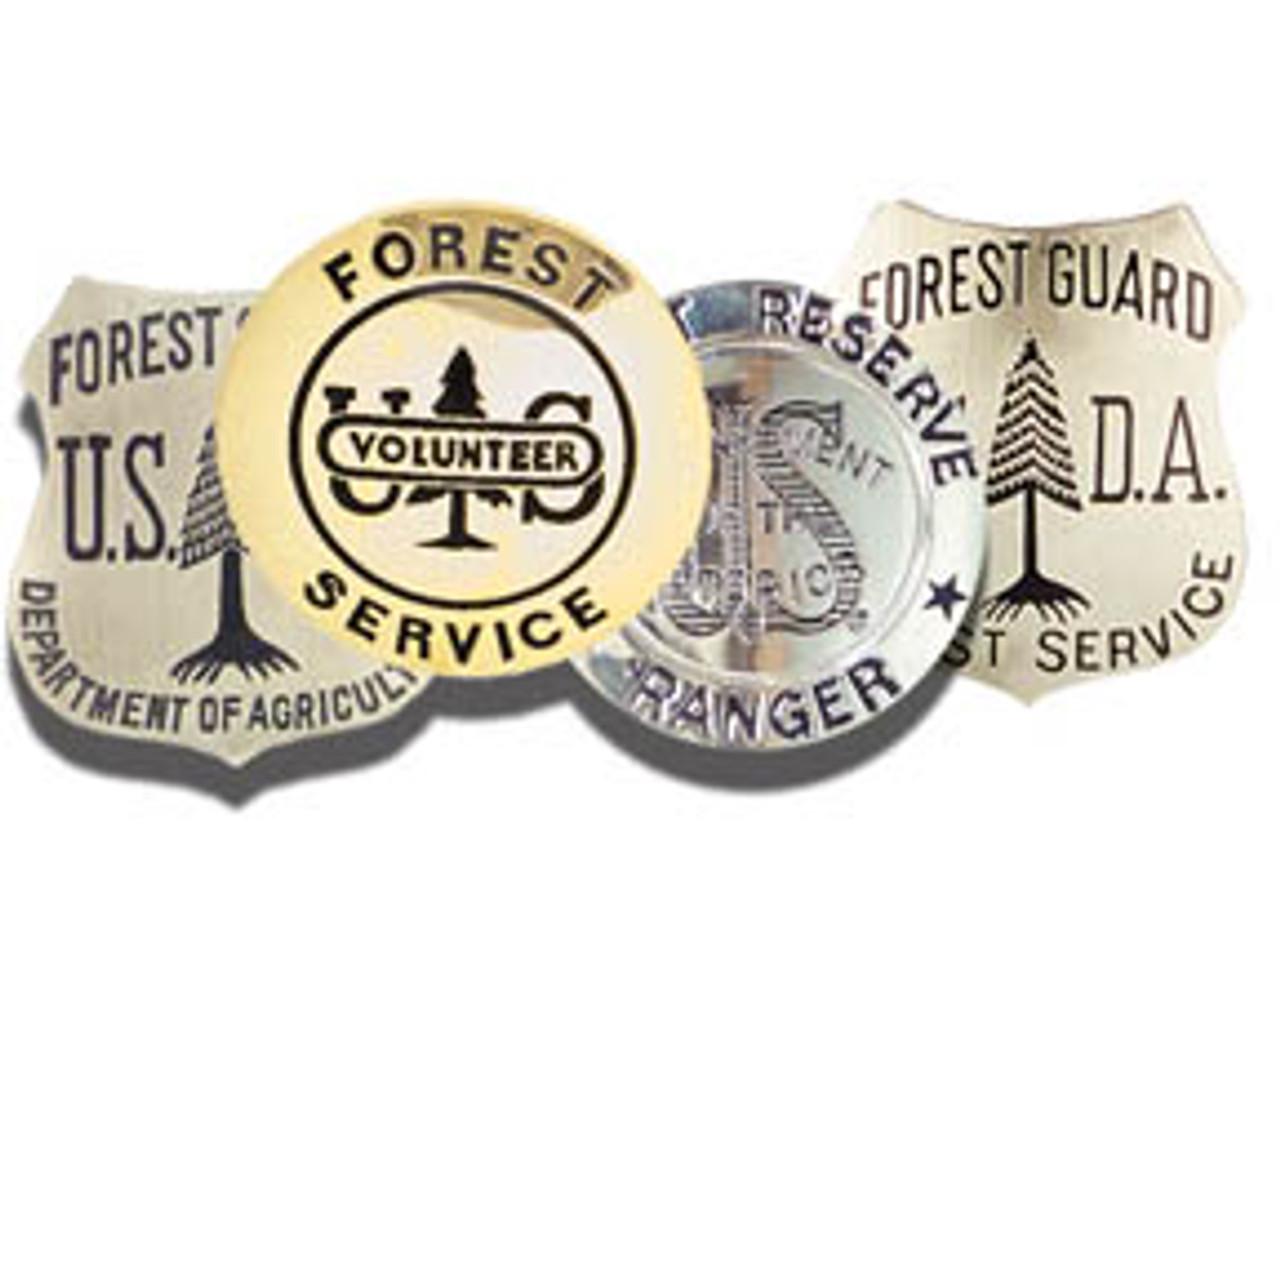 Custom Badges or Coins - Please contact Nicole: art@westernheritage.com